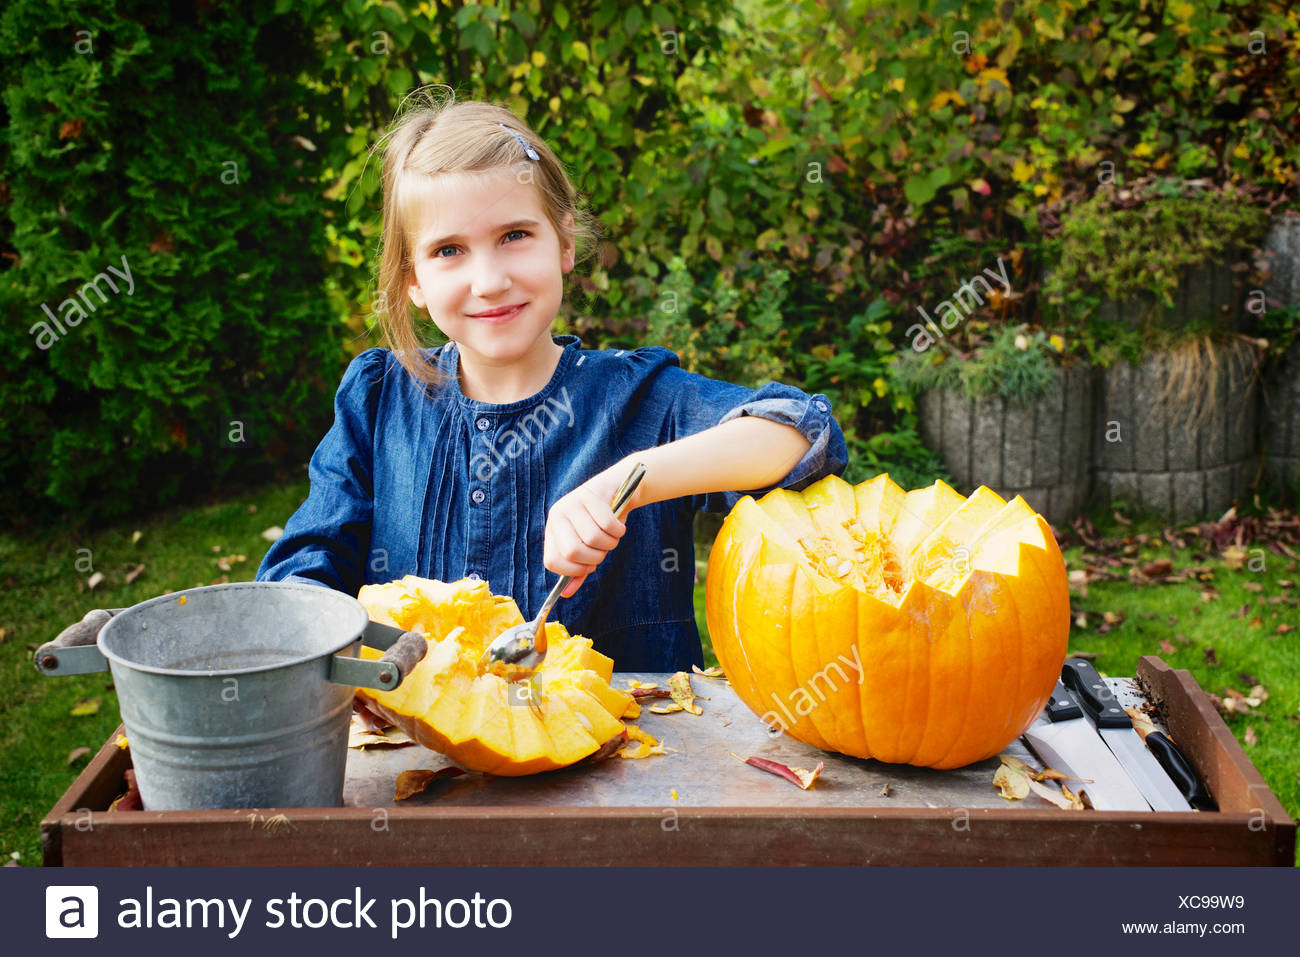 Girl carving Jack O'Lantern - Stock Image